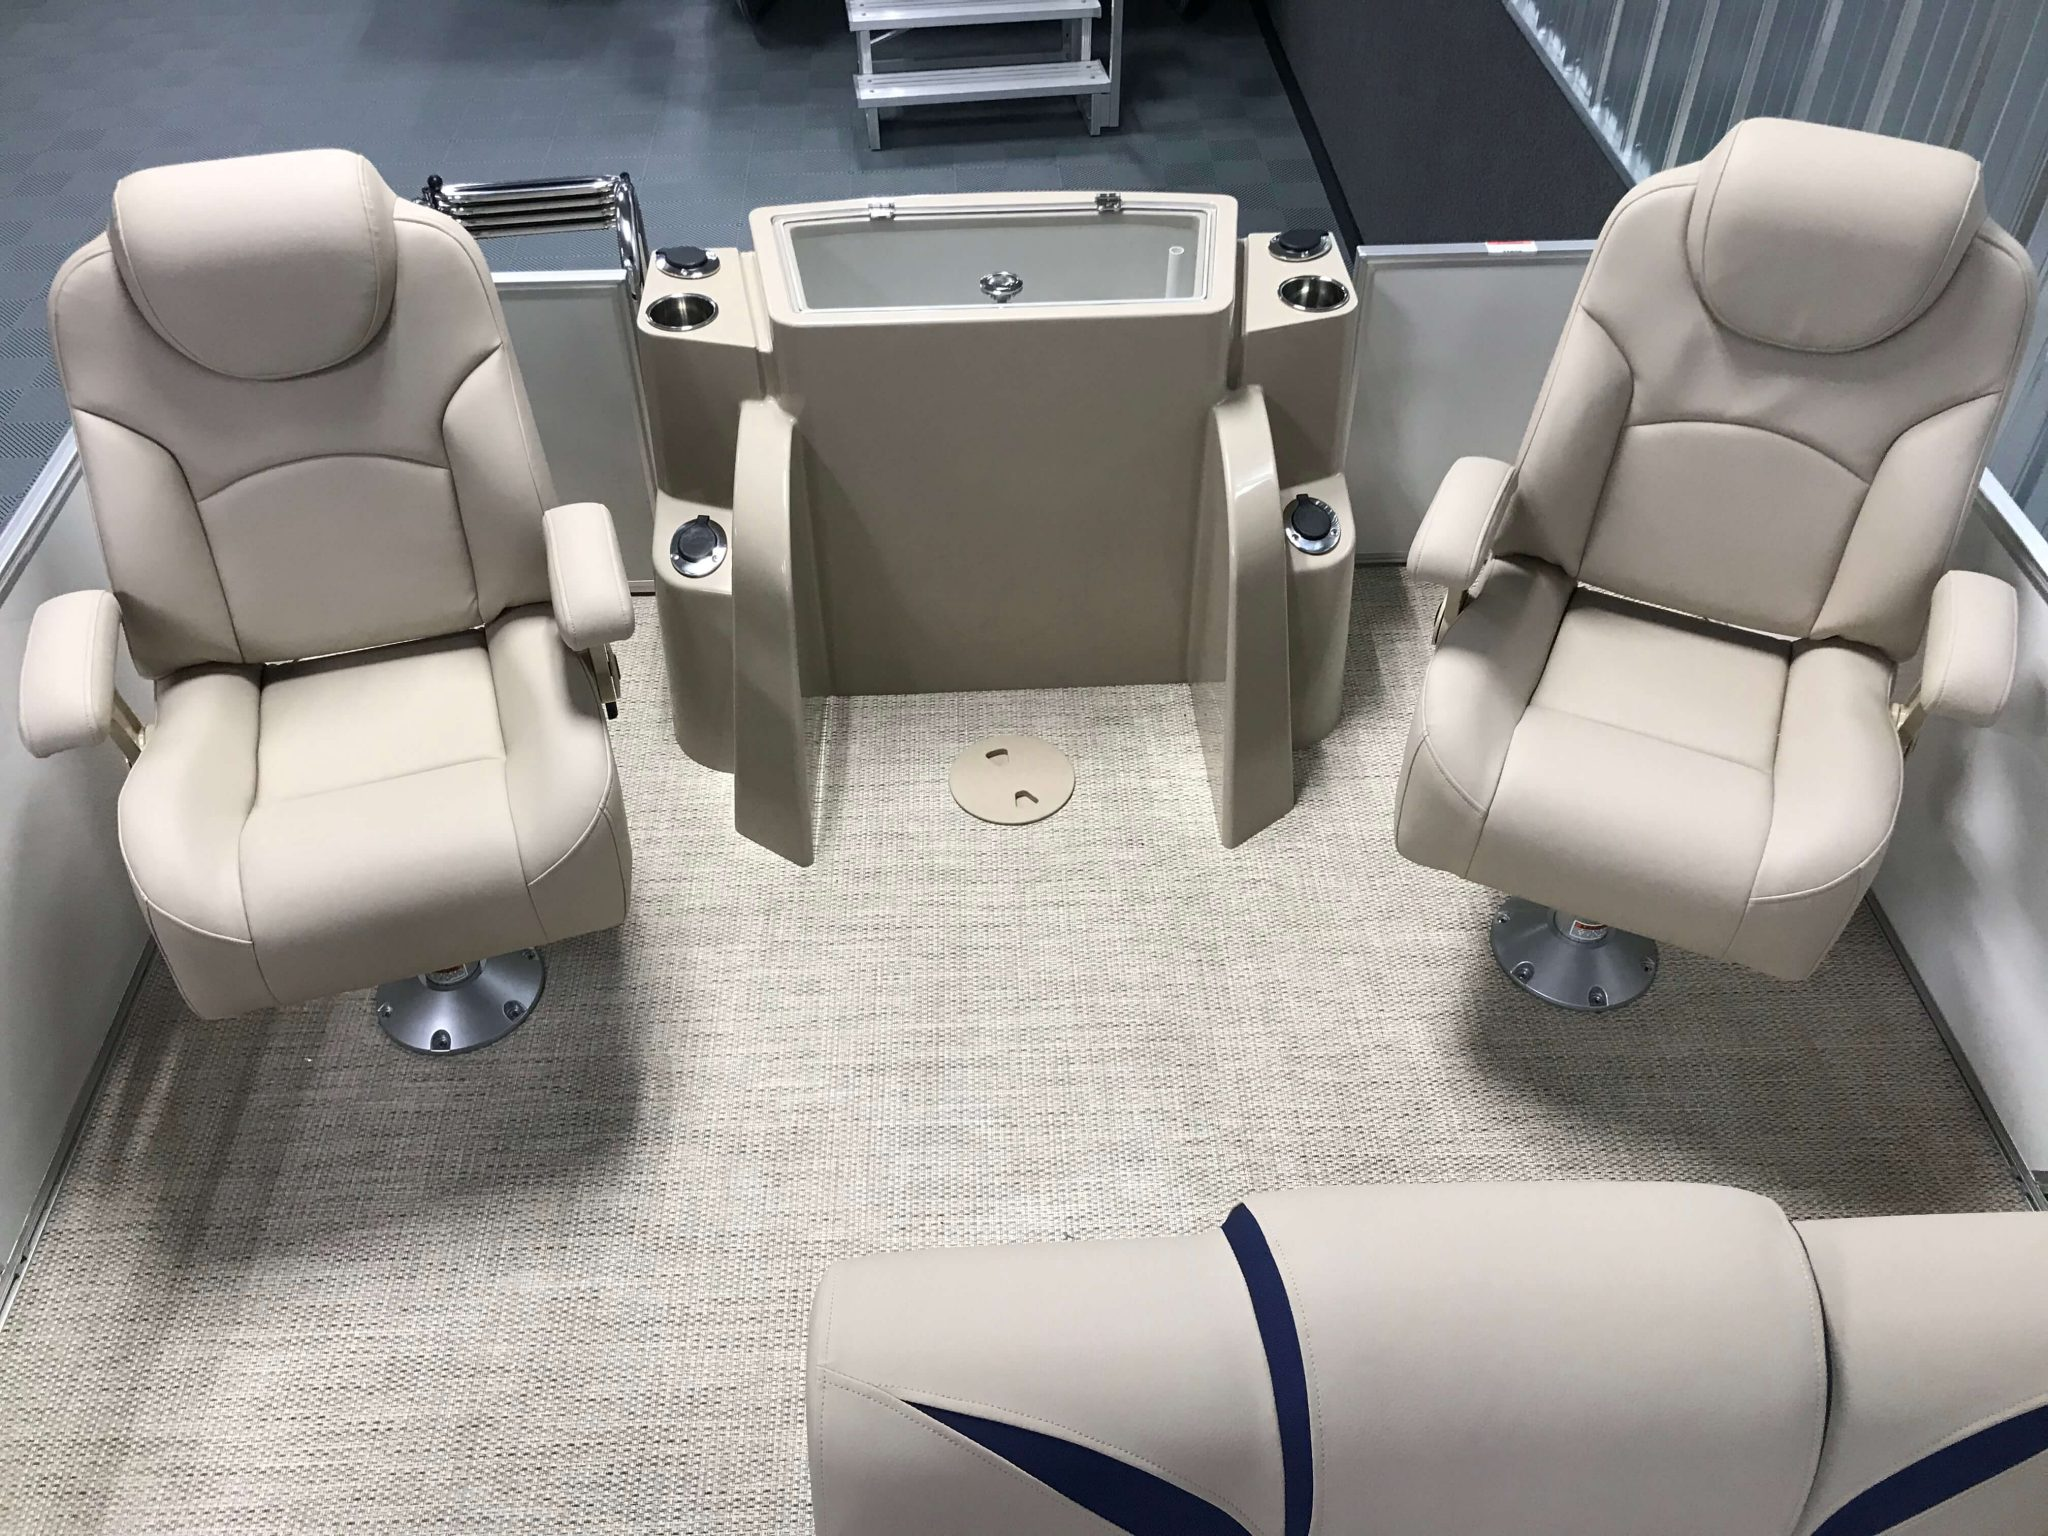 2019 Berkshire 23RFC2 STS Deluxe Pontoon RFC2 Seating Layout 2